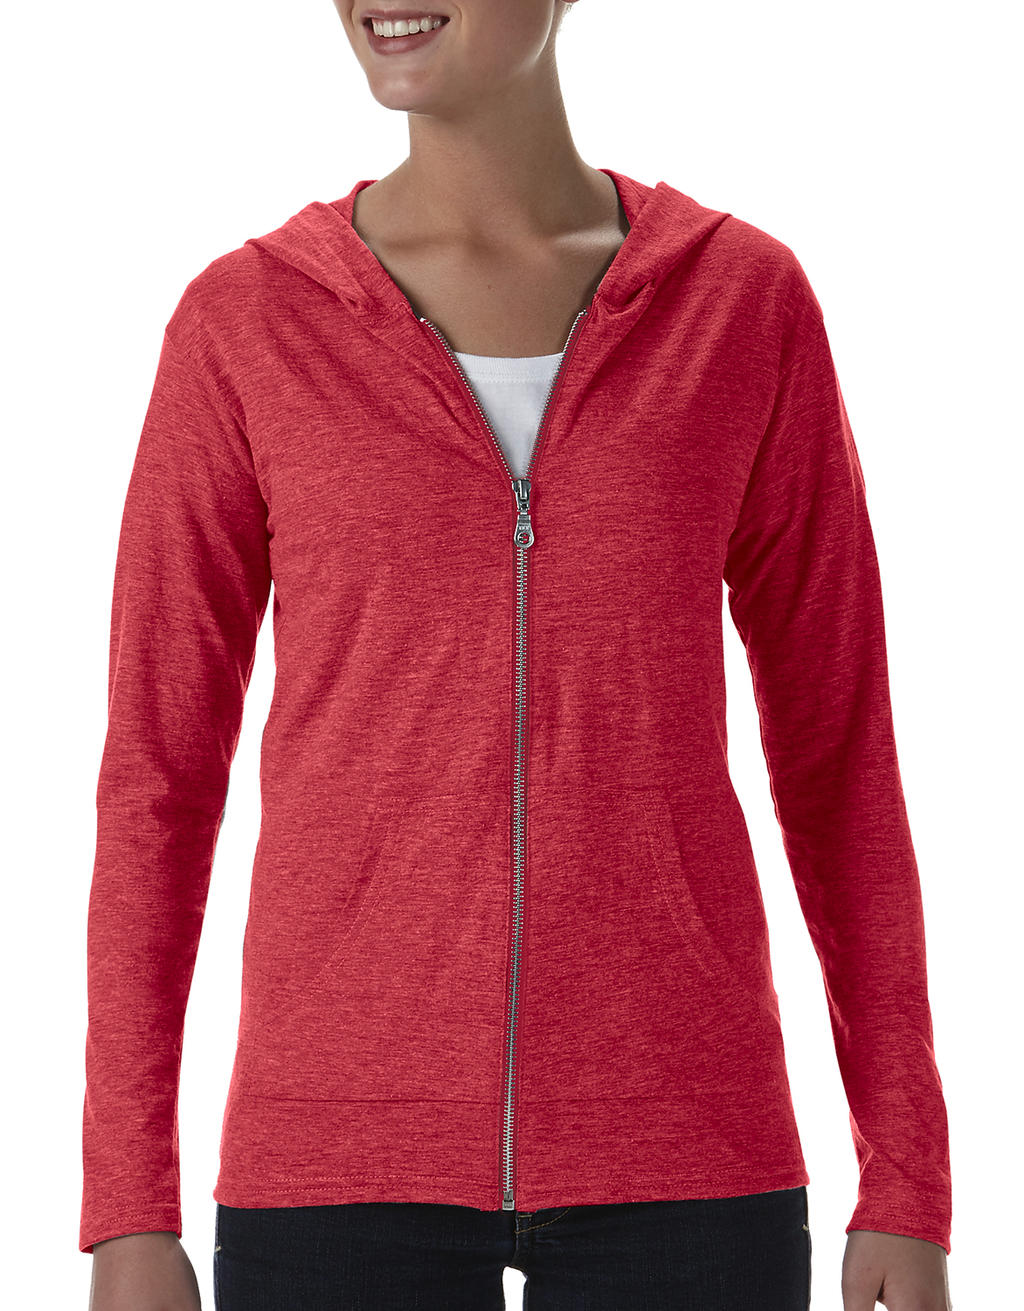 Anvil womens tri-blend full-zip hooded jacket rood